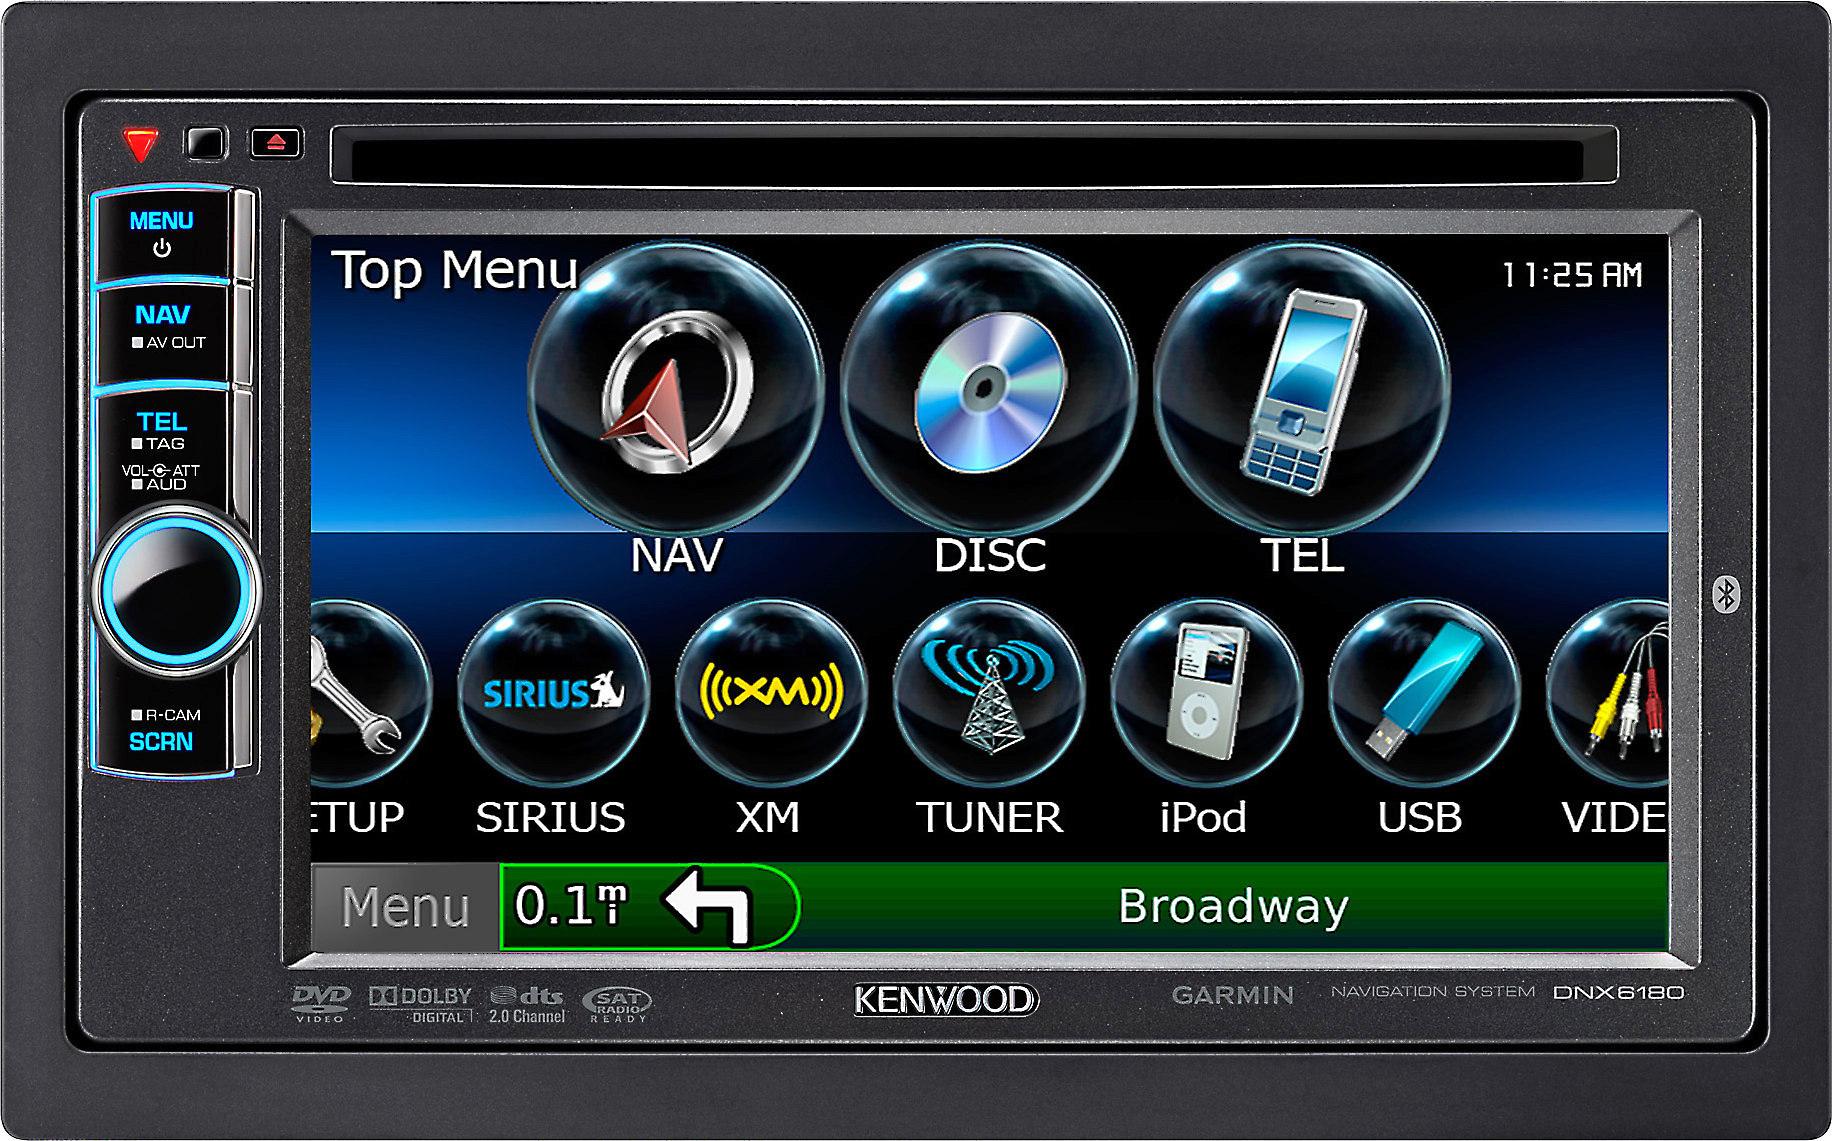 Kenwood DNX6180 Navigation receiver at Crutchfield on